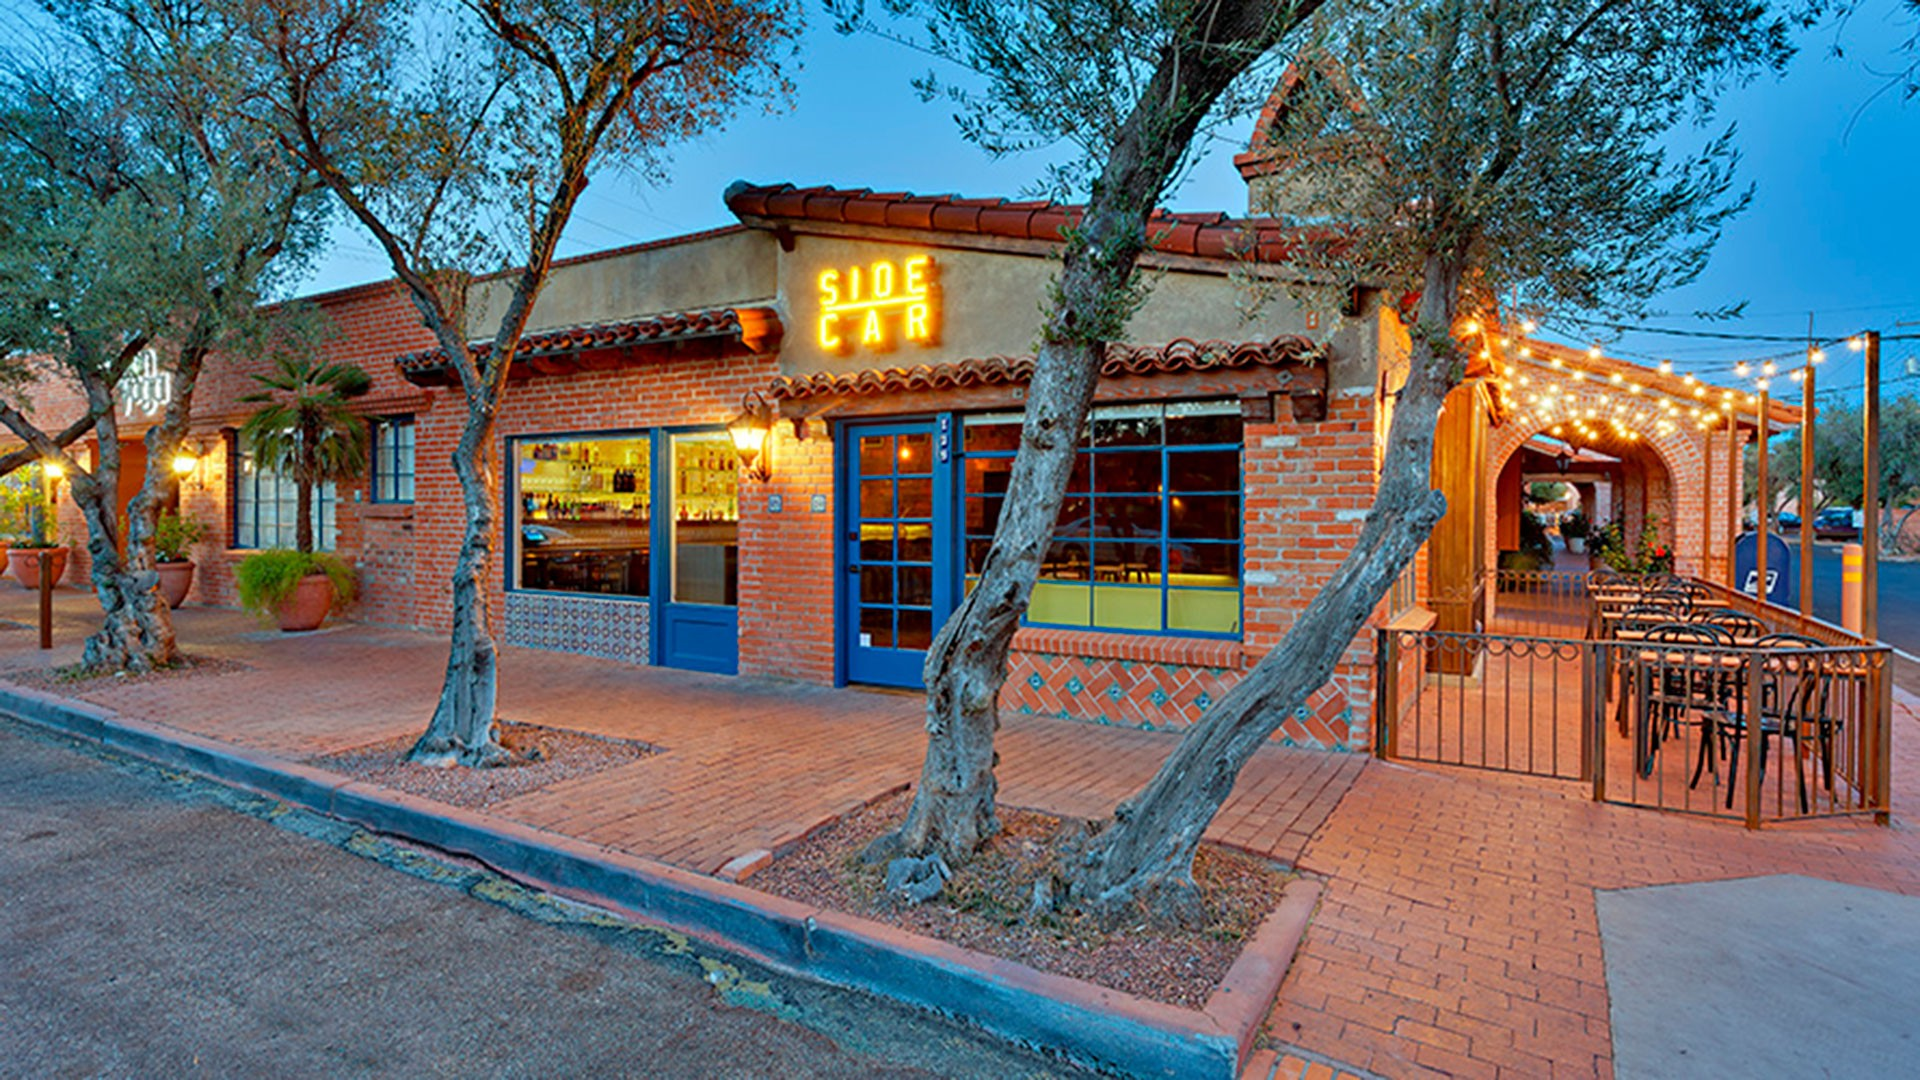 Sidecar Tucson Arizona Ais Industries Inc